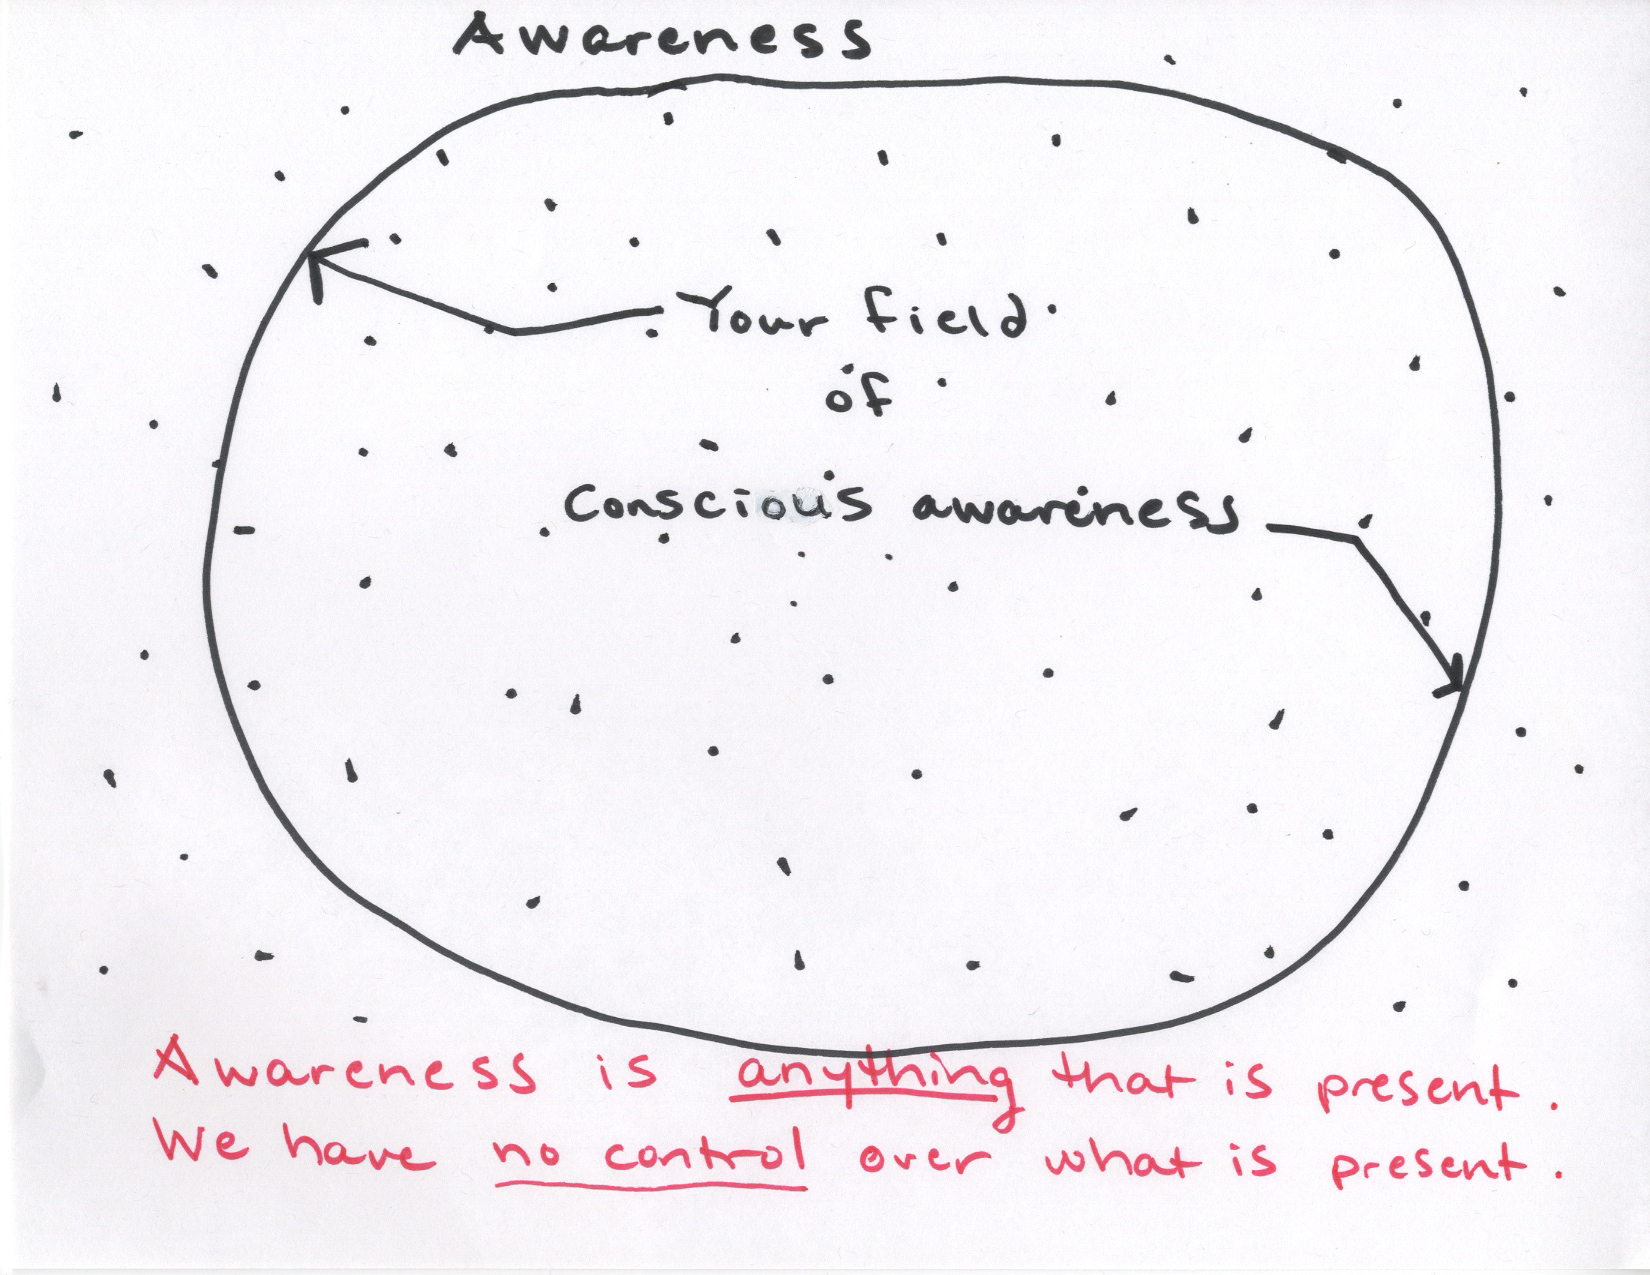 FieldofConsciousAwareness.jpg